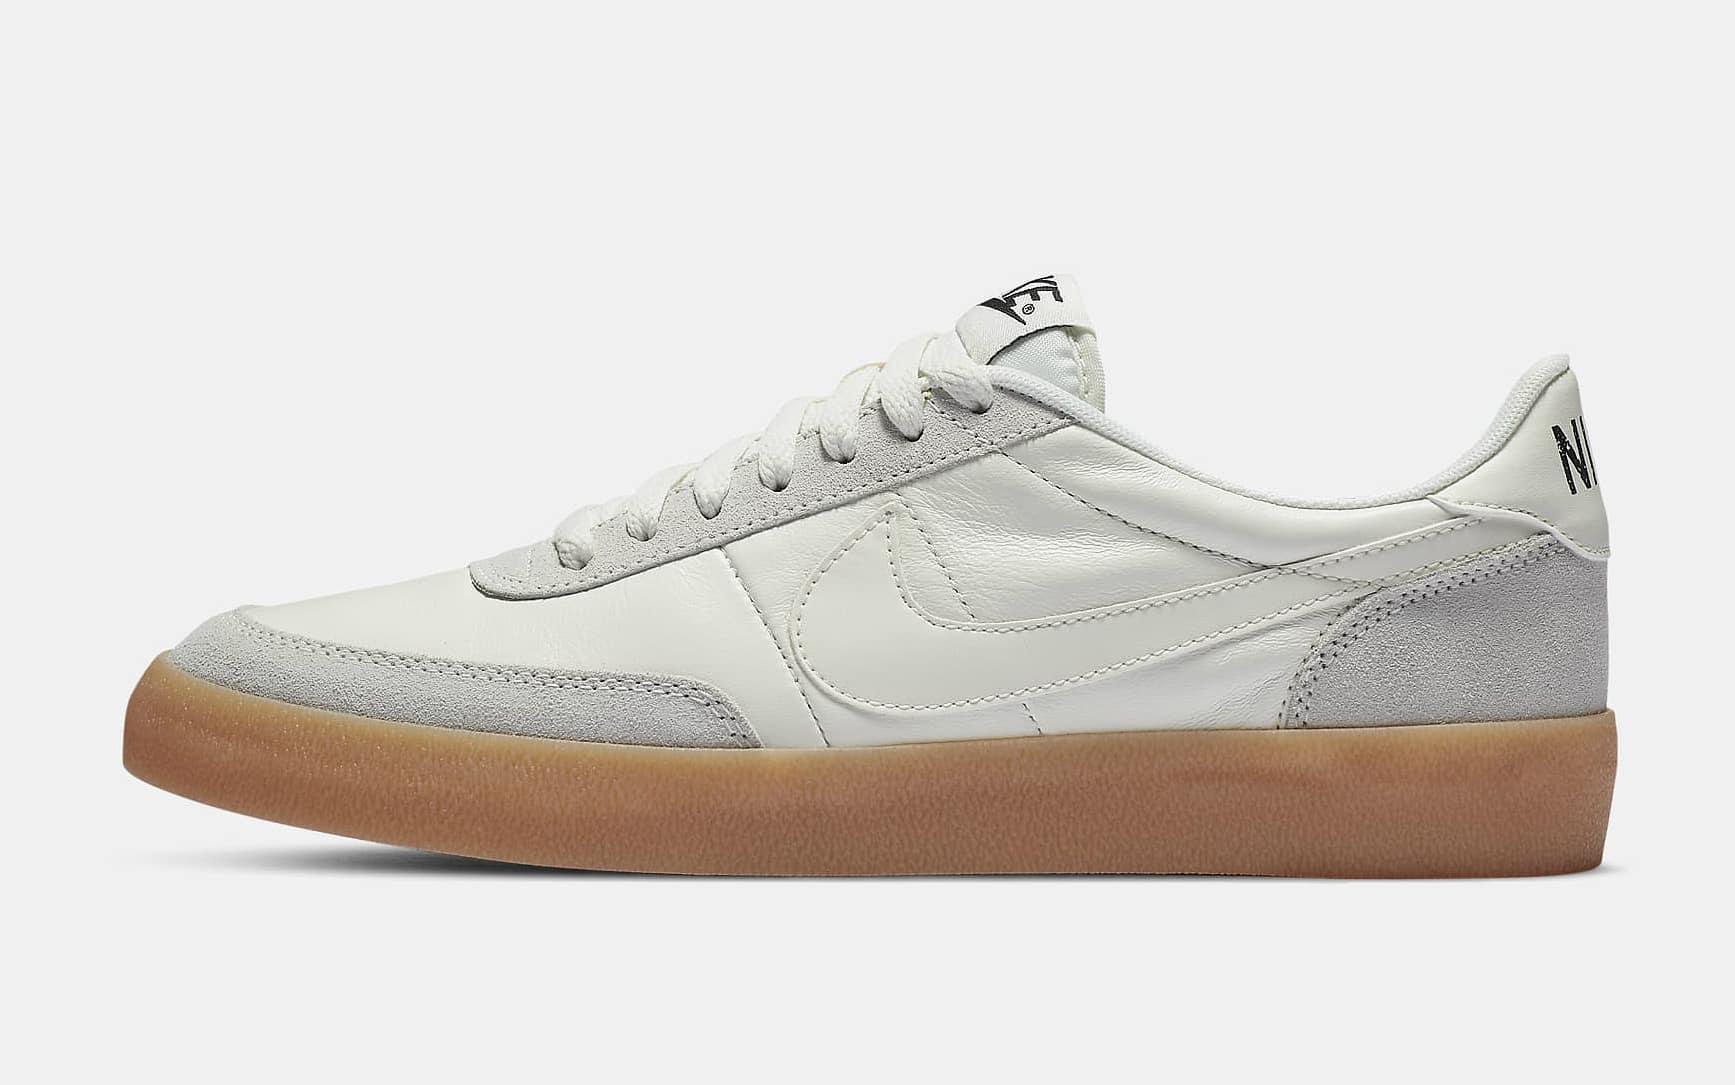 Nike Killshot 2 Leather Sneakers